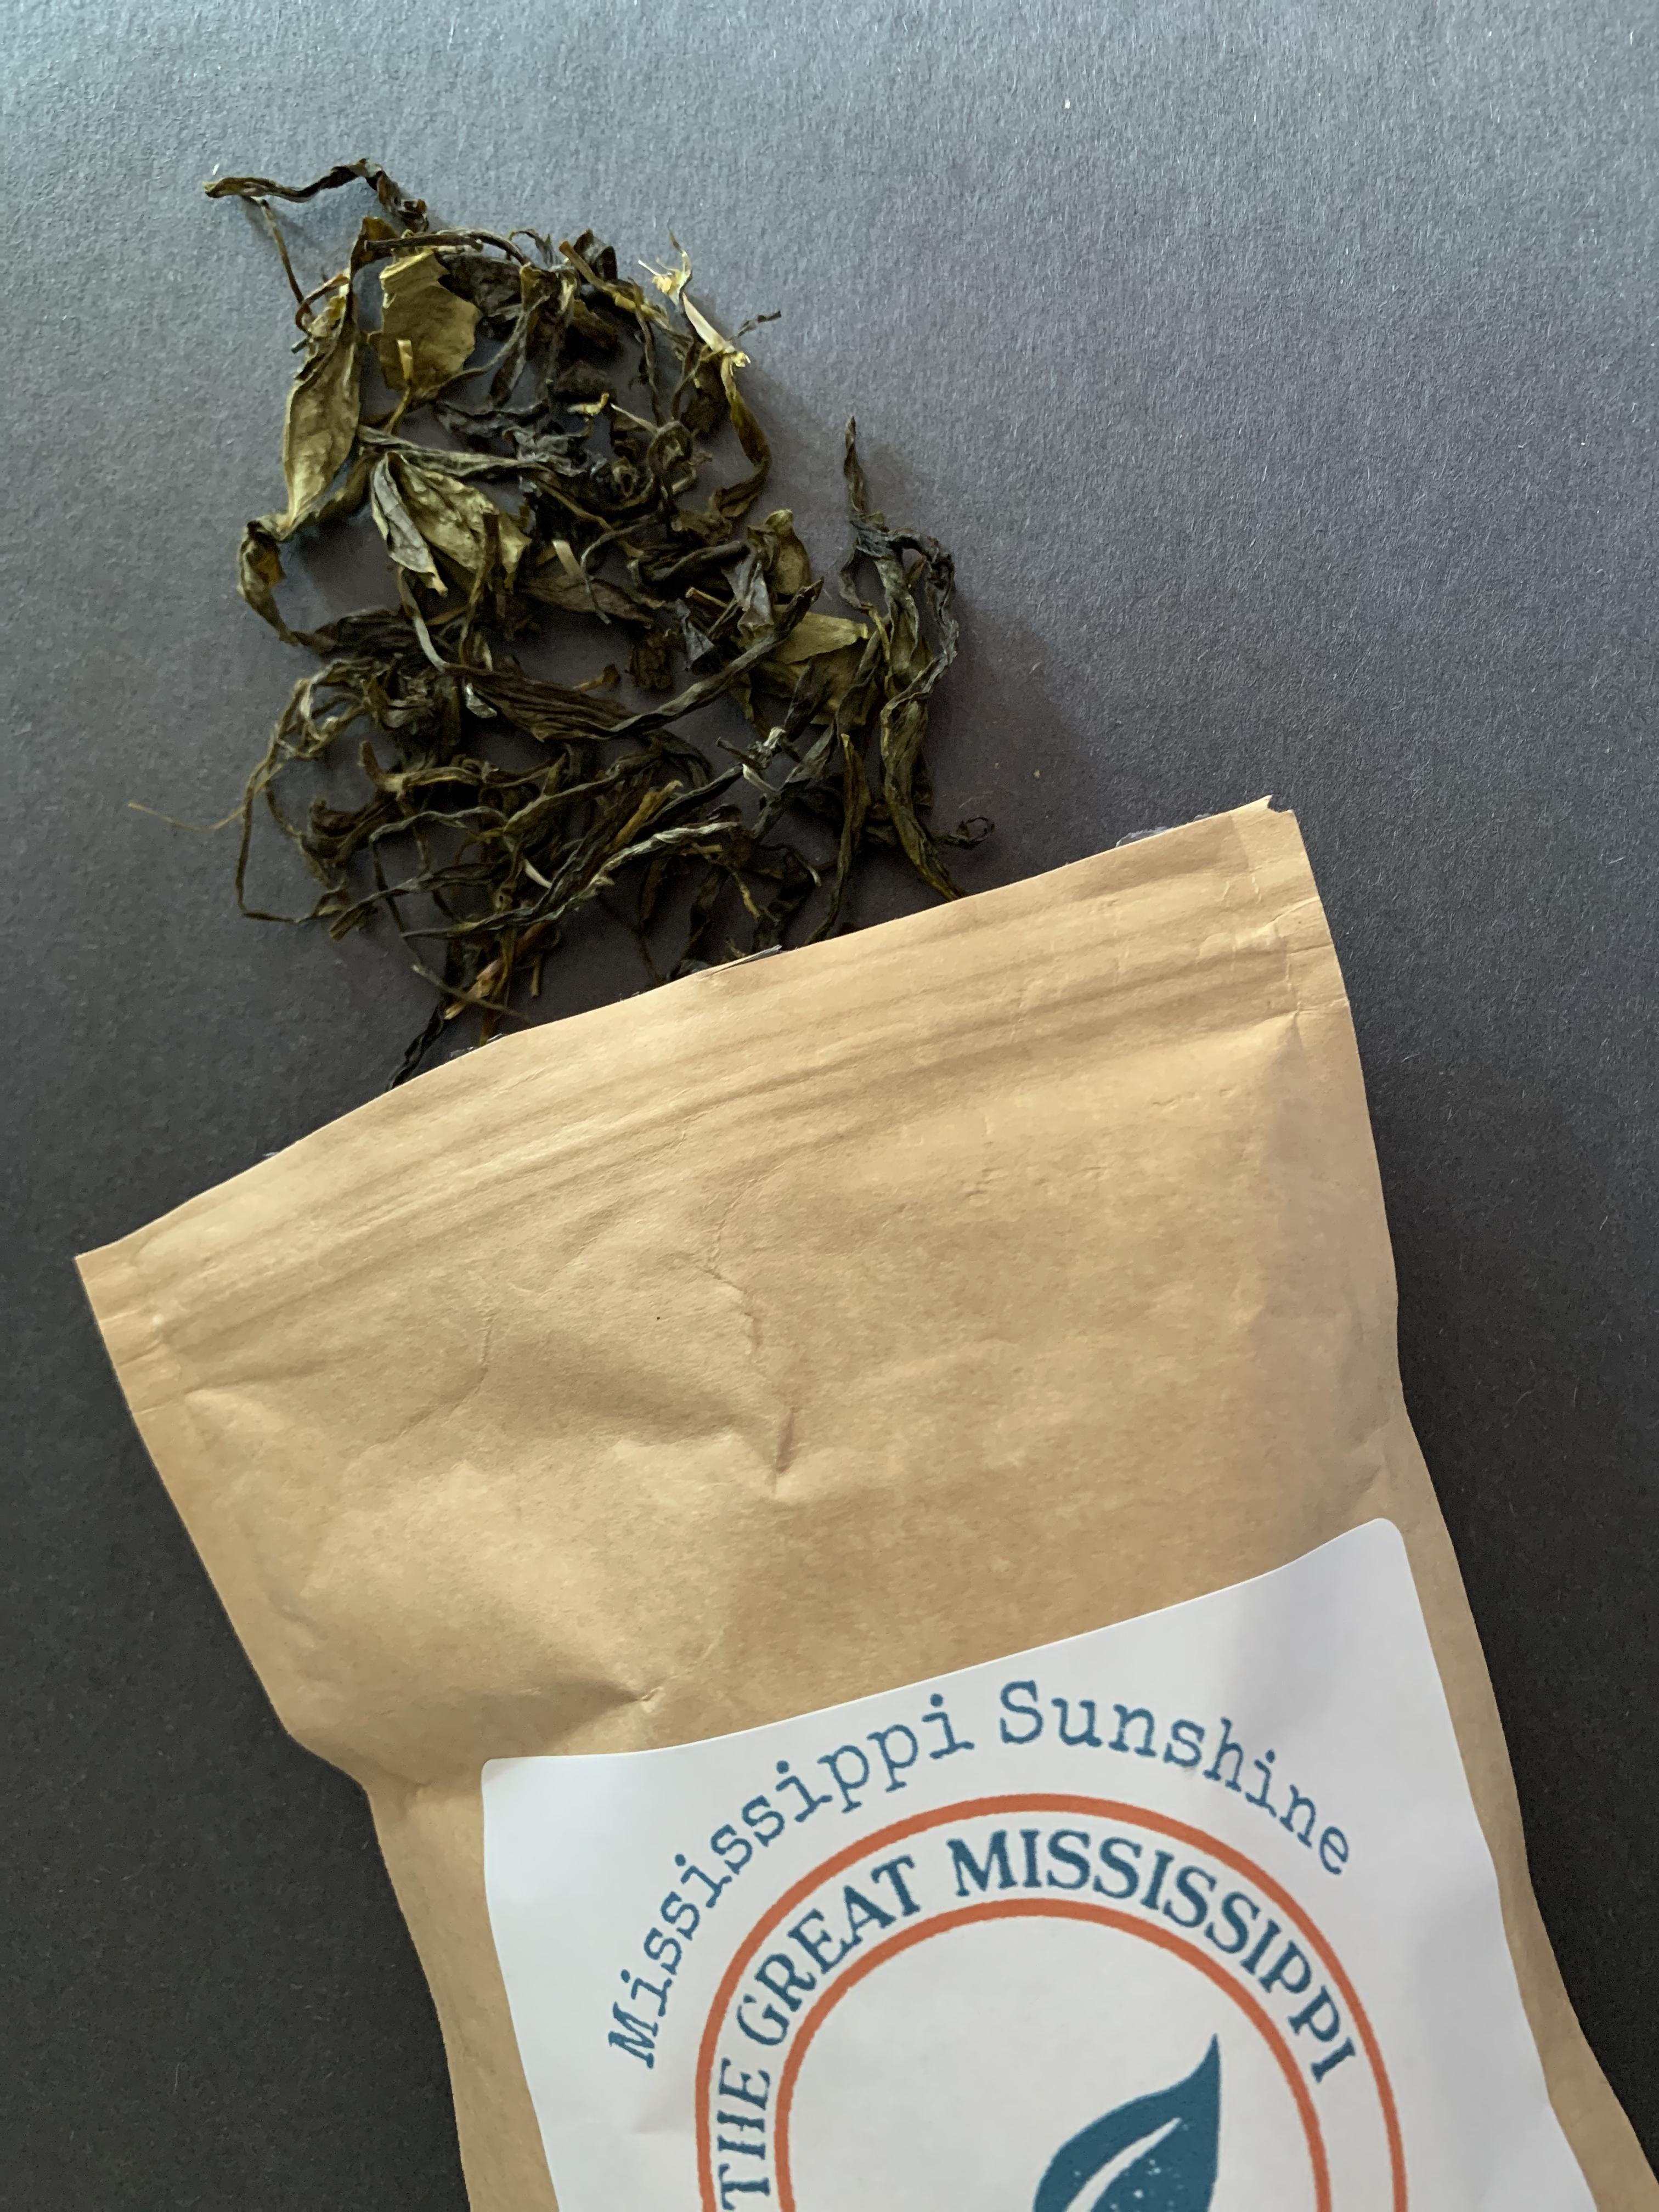 Mississppi Sunshine Tea